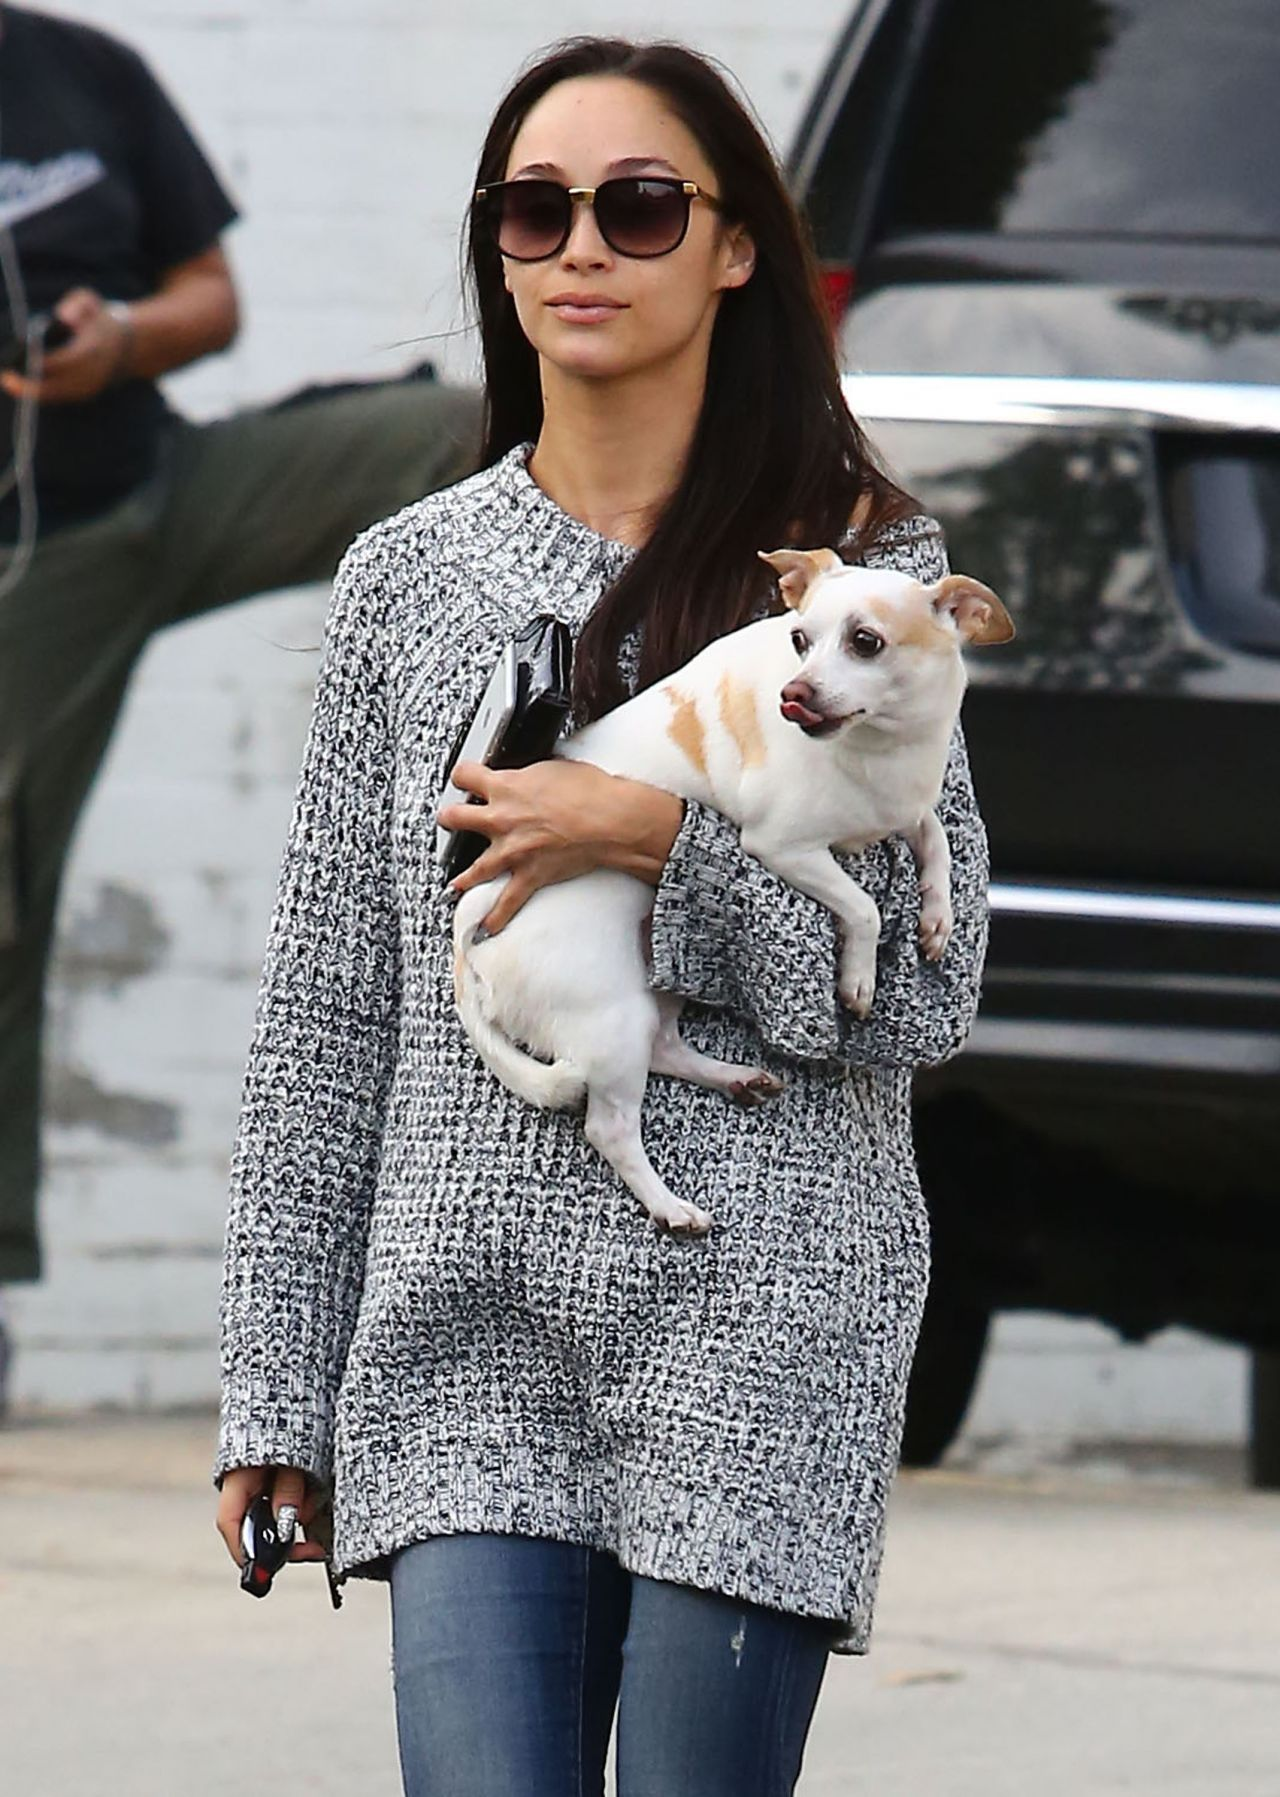 Cara Santana U2013 Heads To A Pet Store In Los Angeles